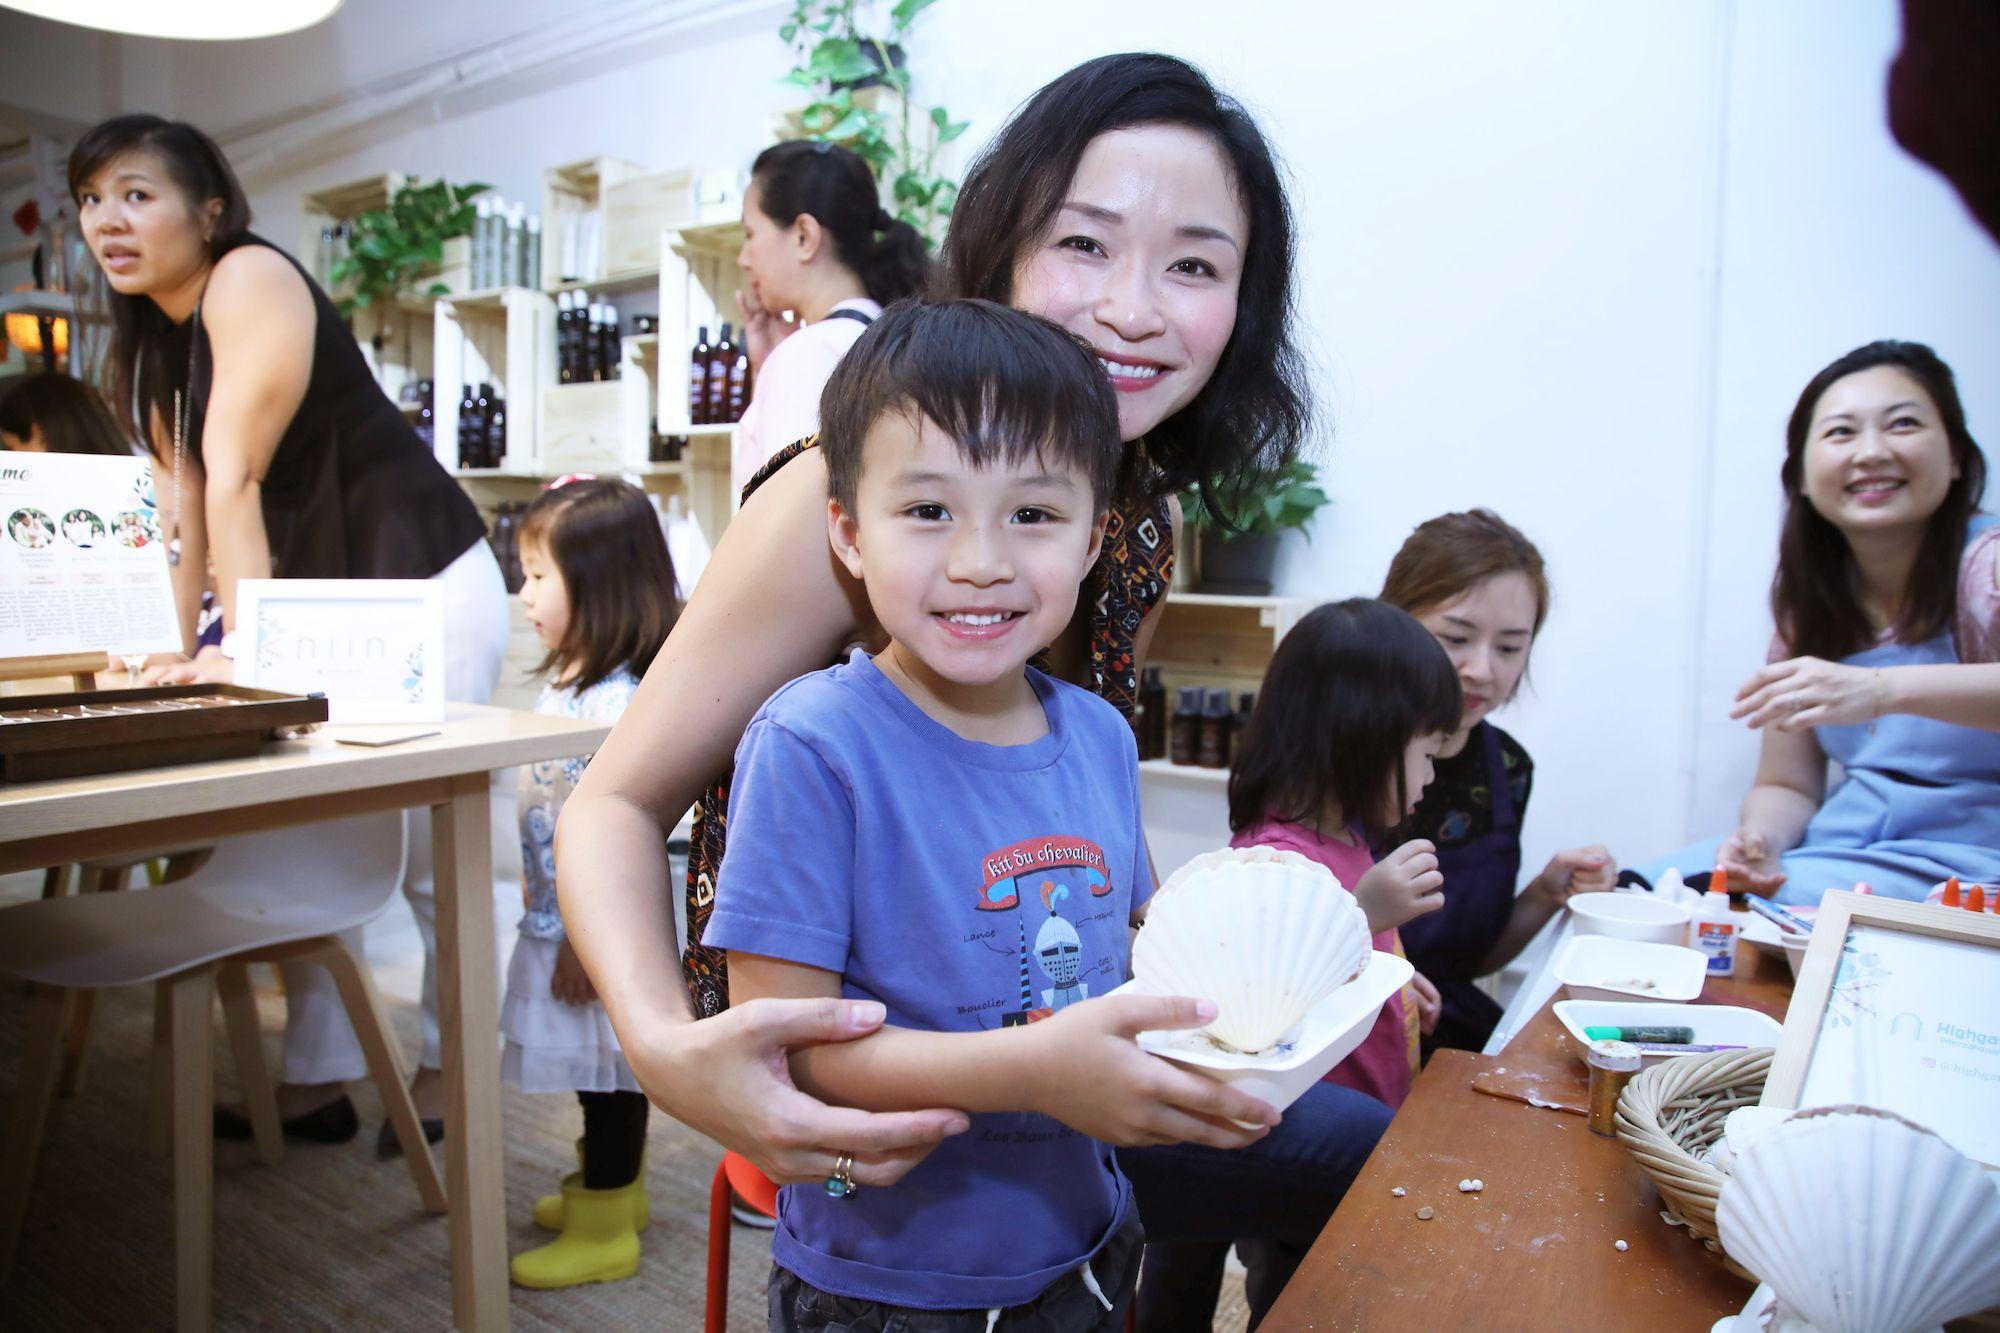 Joleen Soo and her son Gabriel